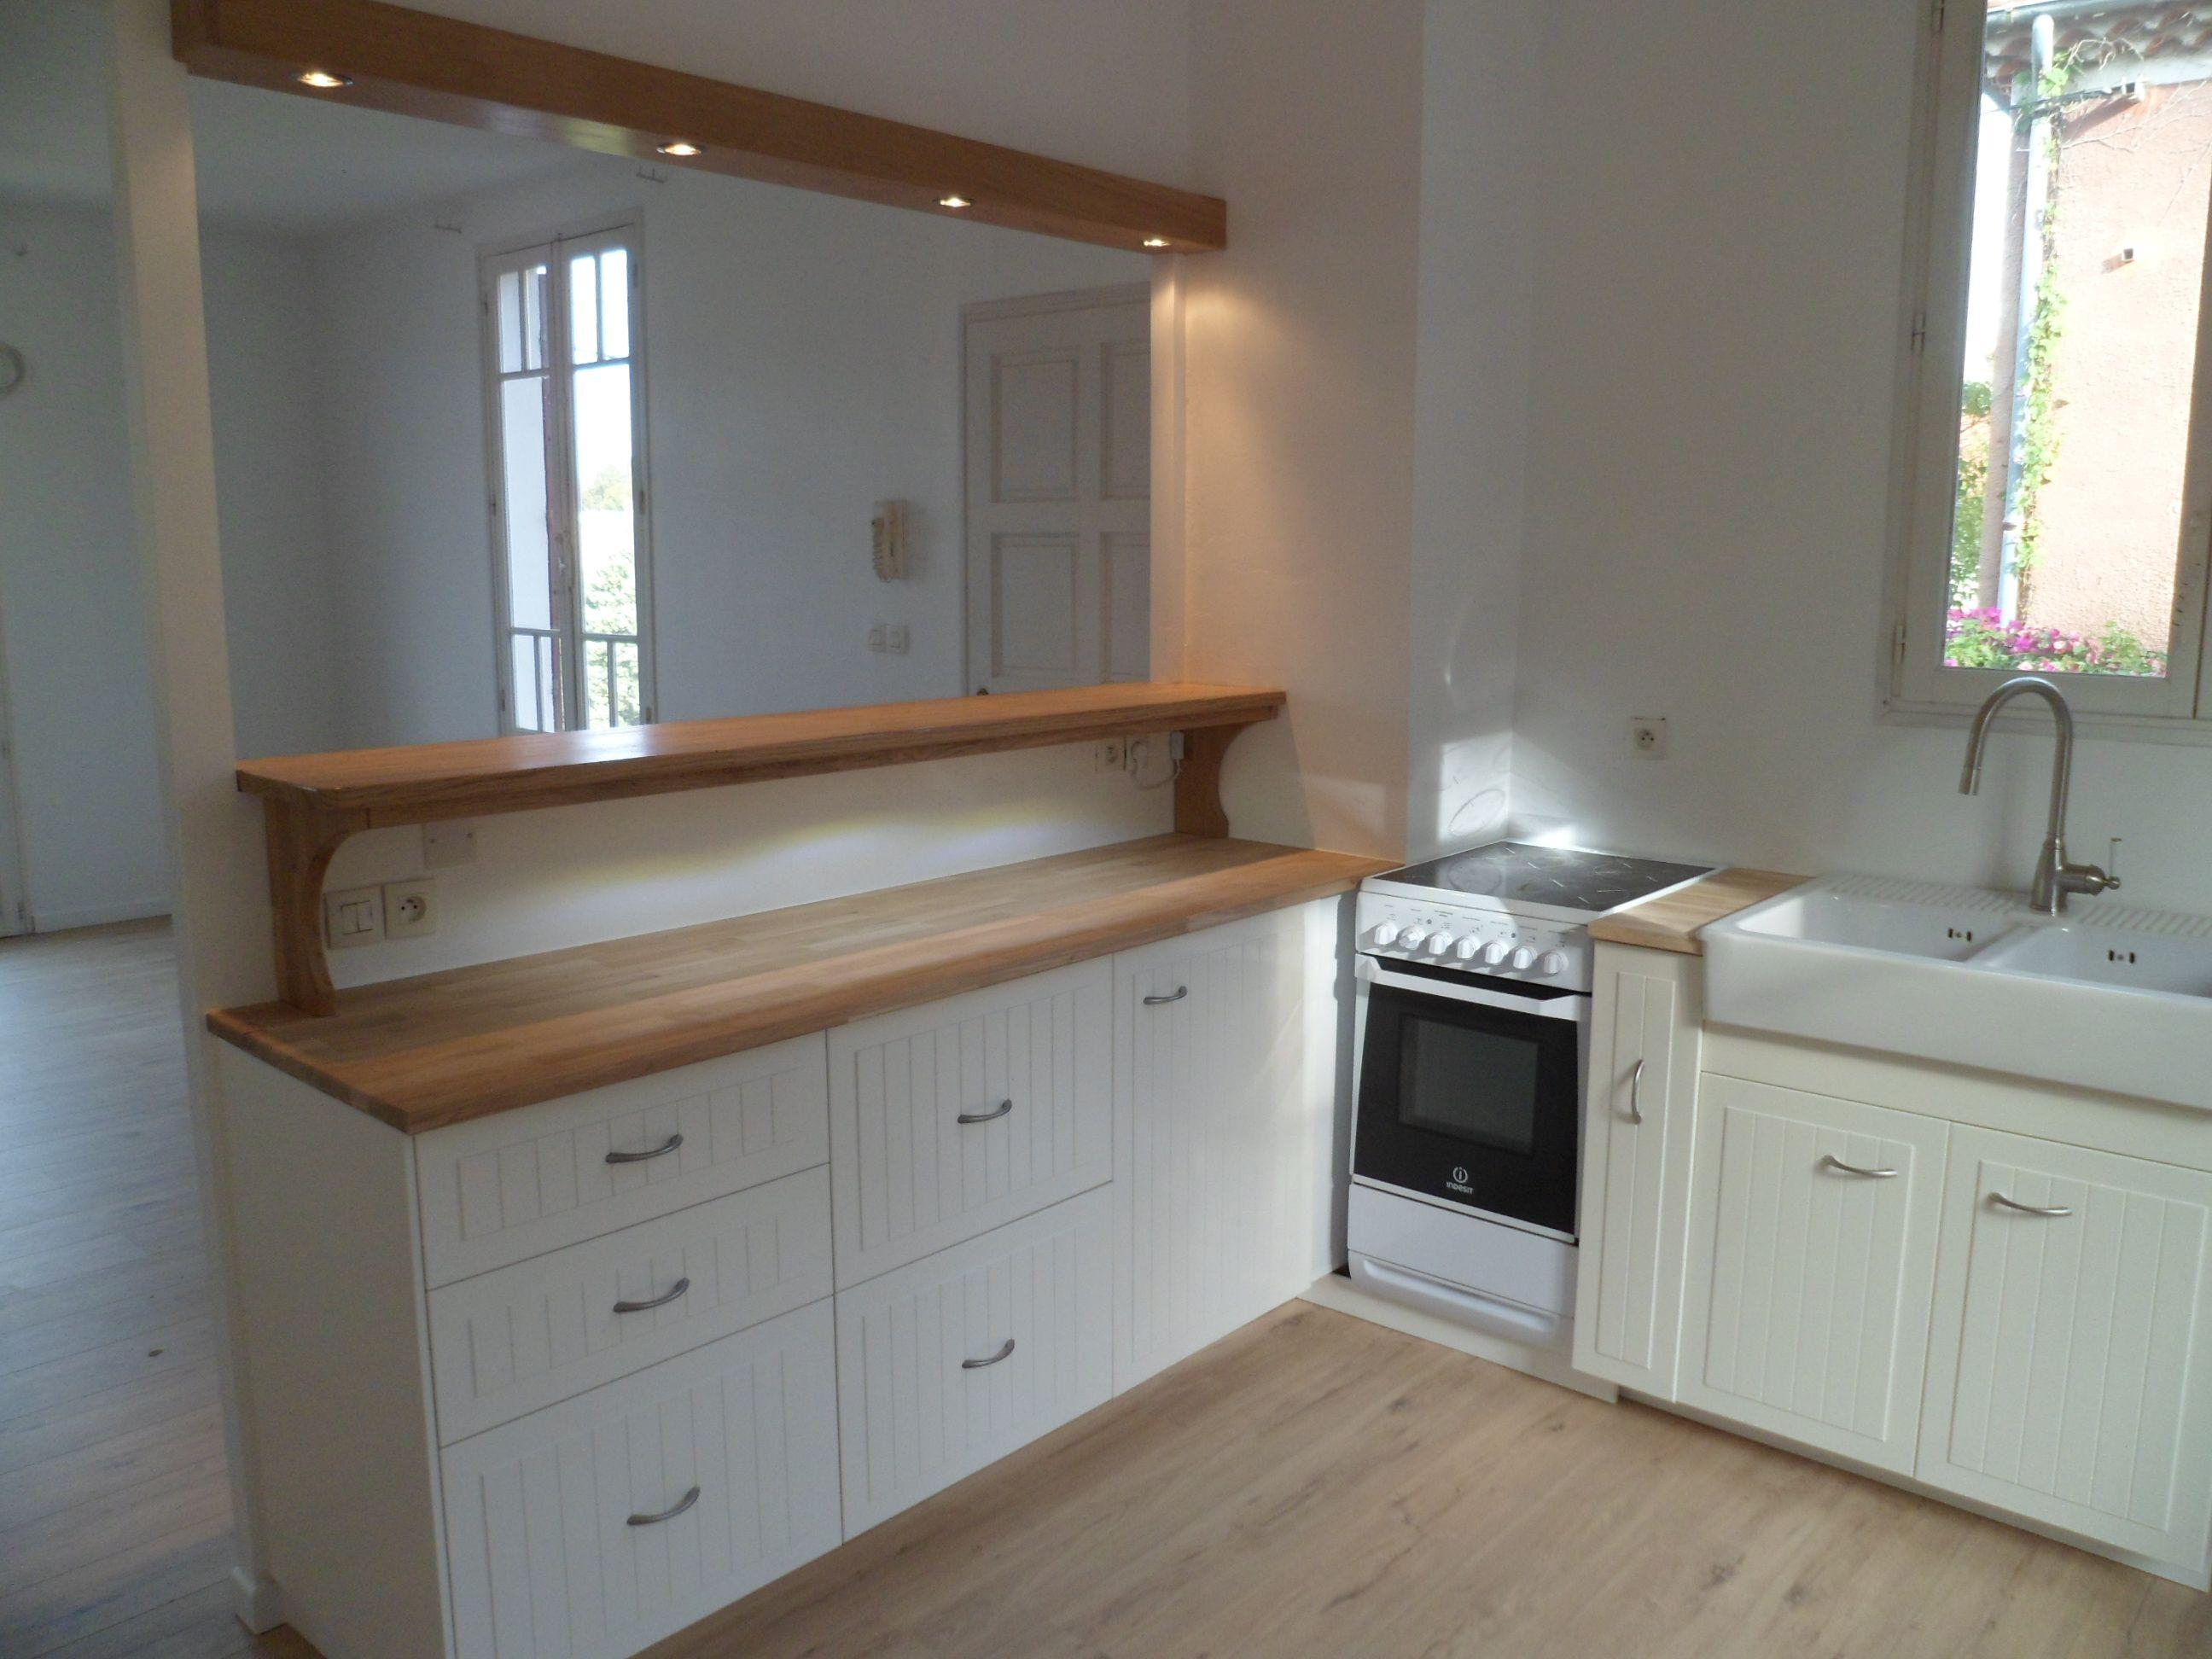 Custom Design Kitchen By Johnny Brico With Open Access To Living Room Features Oak Flooring Oak Meuble Cuisine Meuble Plan De Travail Cuisine Ikea Meuble Bas